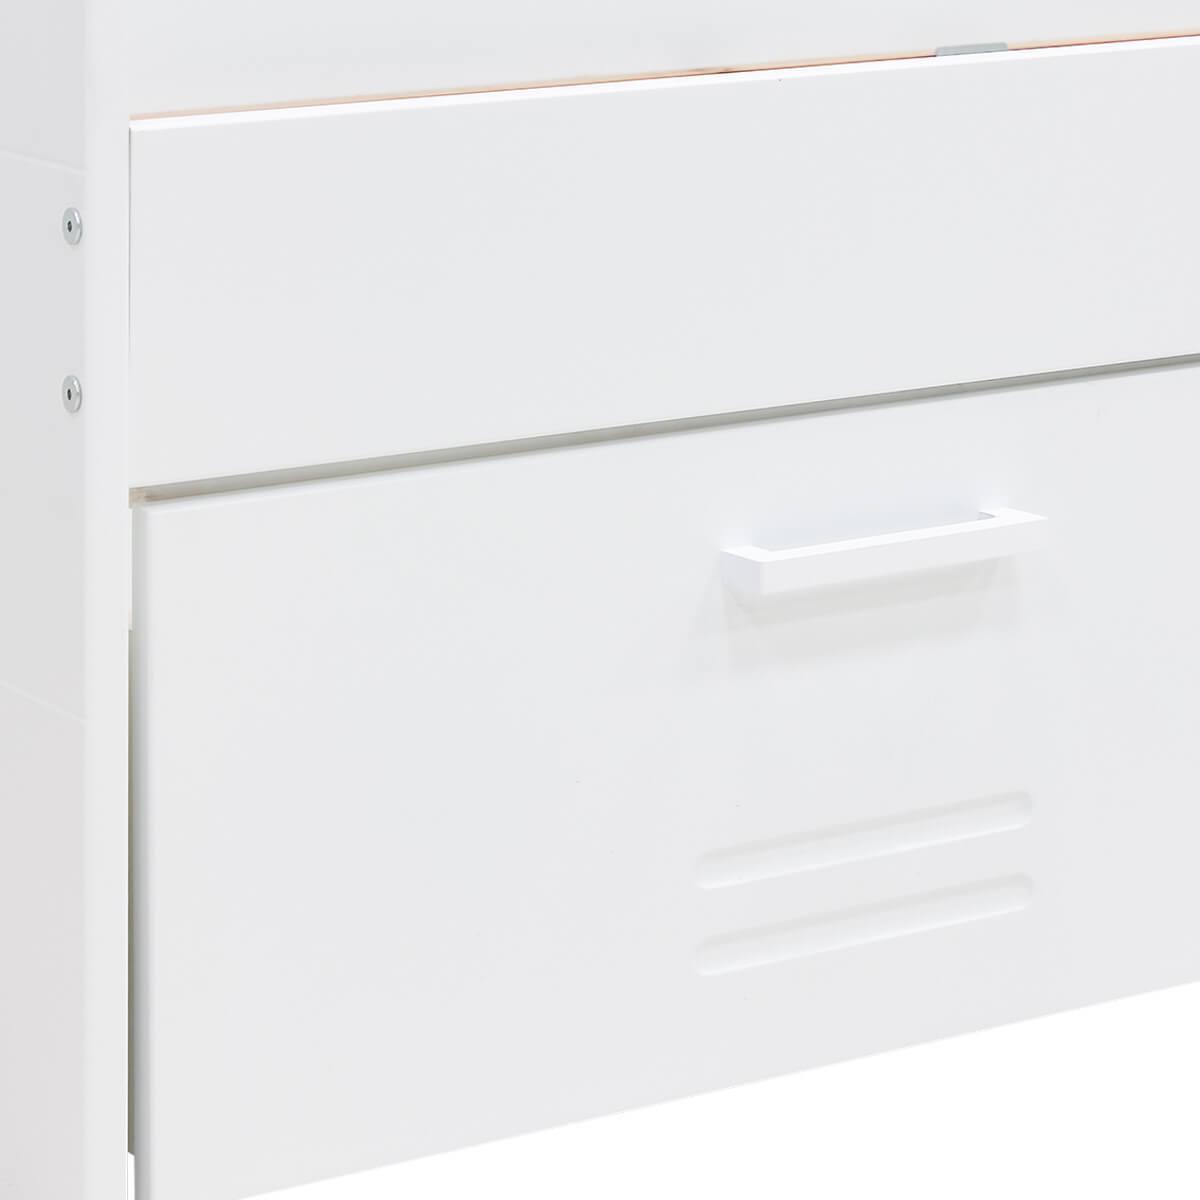 Cama-sofá 90X200cm 3 cajones LOCKER Bopita blanco